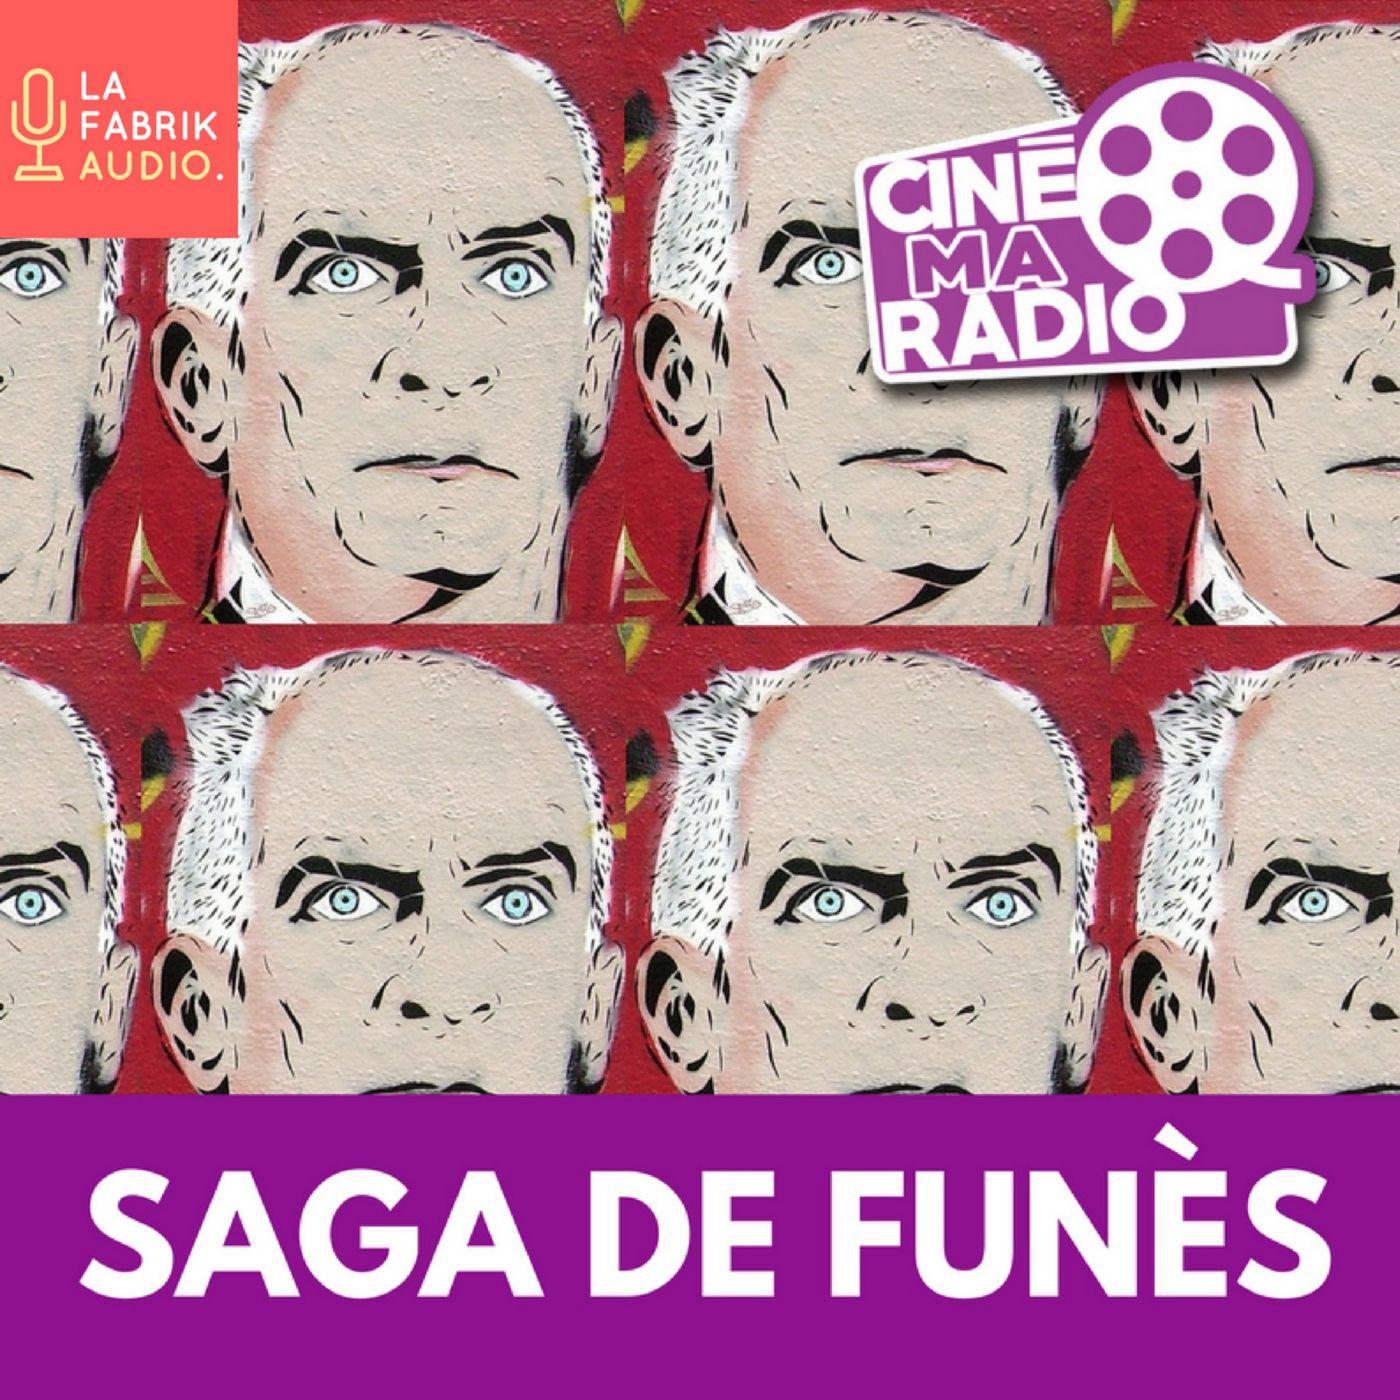 PODCAST CINEMA   SAGA DE FUNES #5   CinéMaRadio